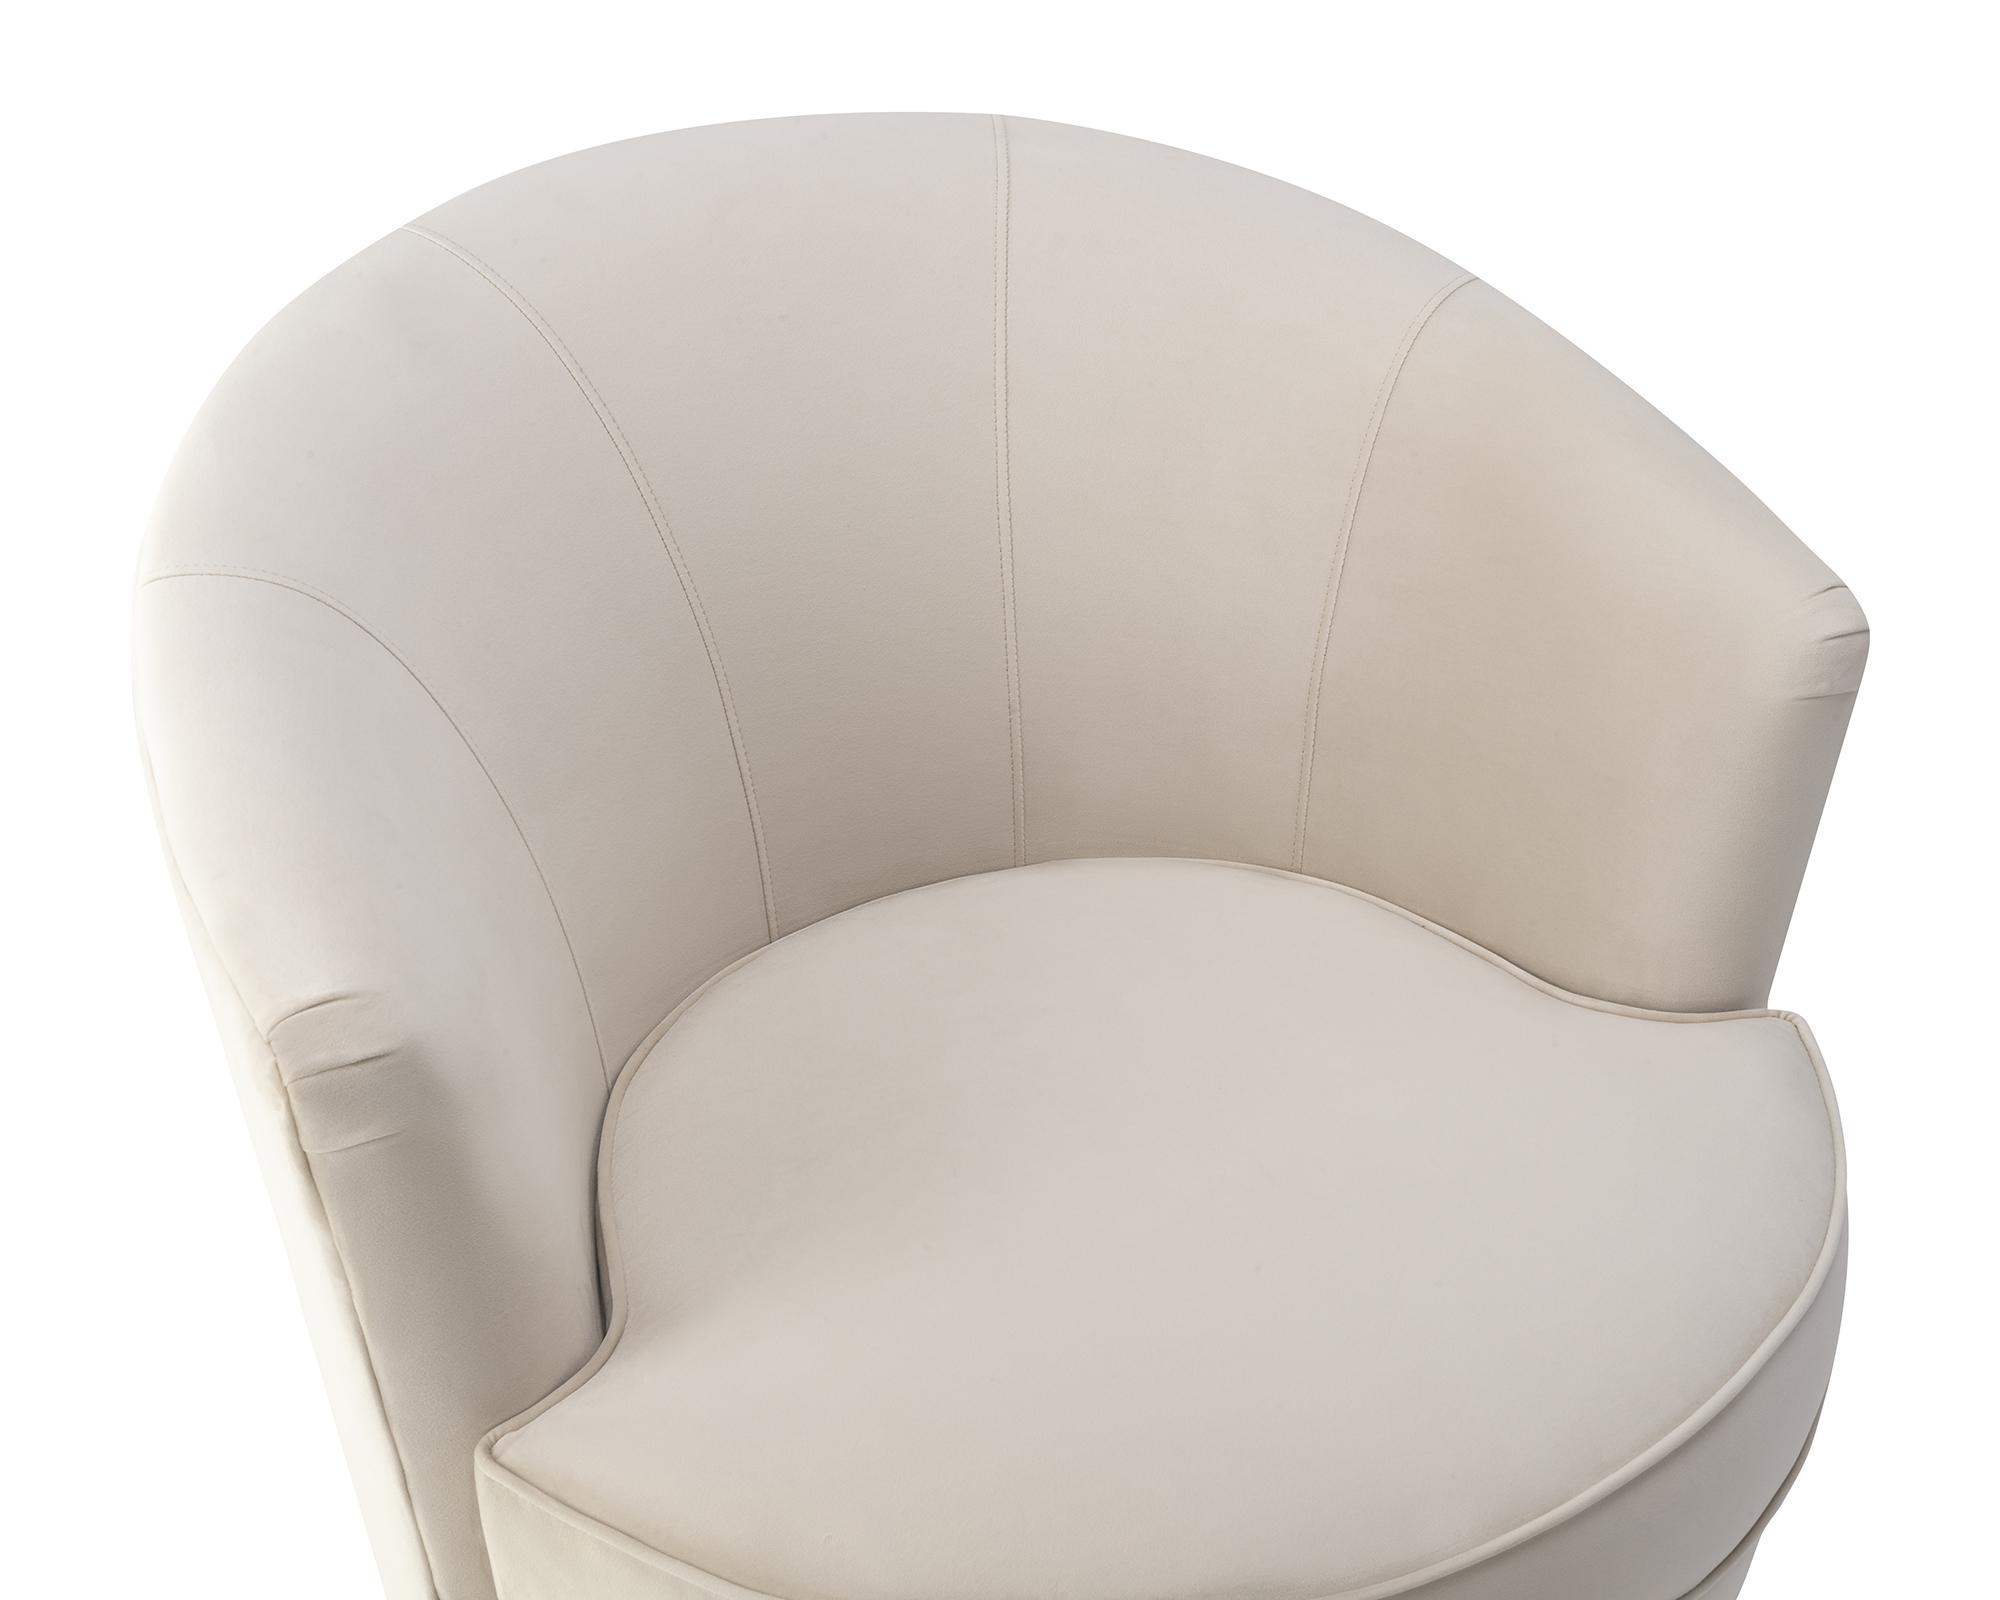 Liang & Eimil Kiss Occasional Chair Tan Beige Velvet BH-OCH-084 (4)